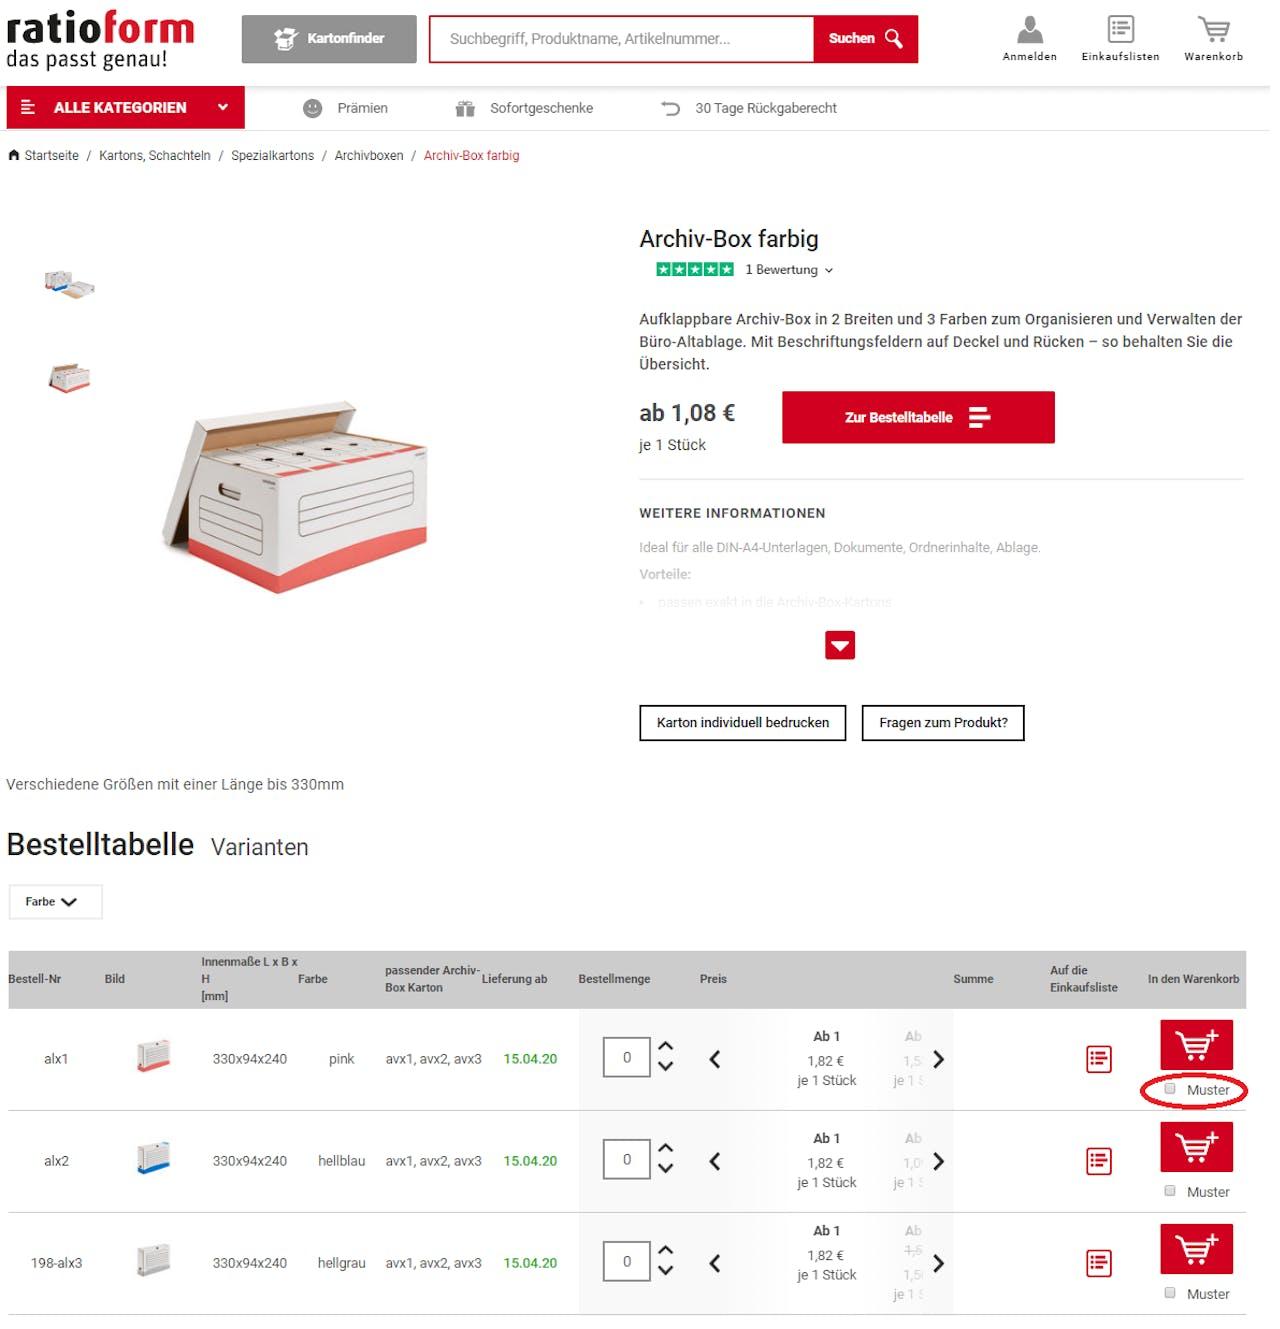 Musterbestellung ratioform Webshop